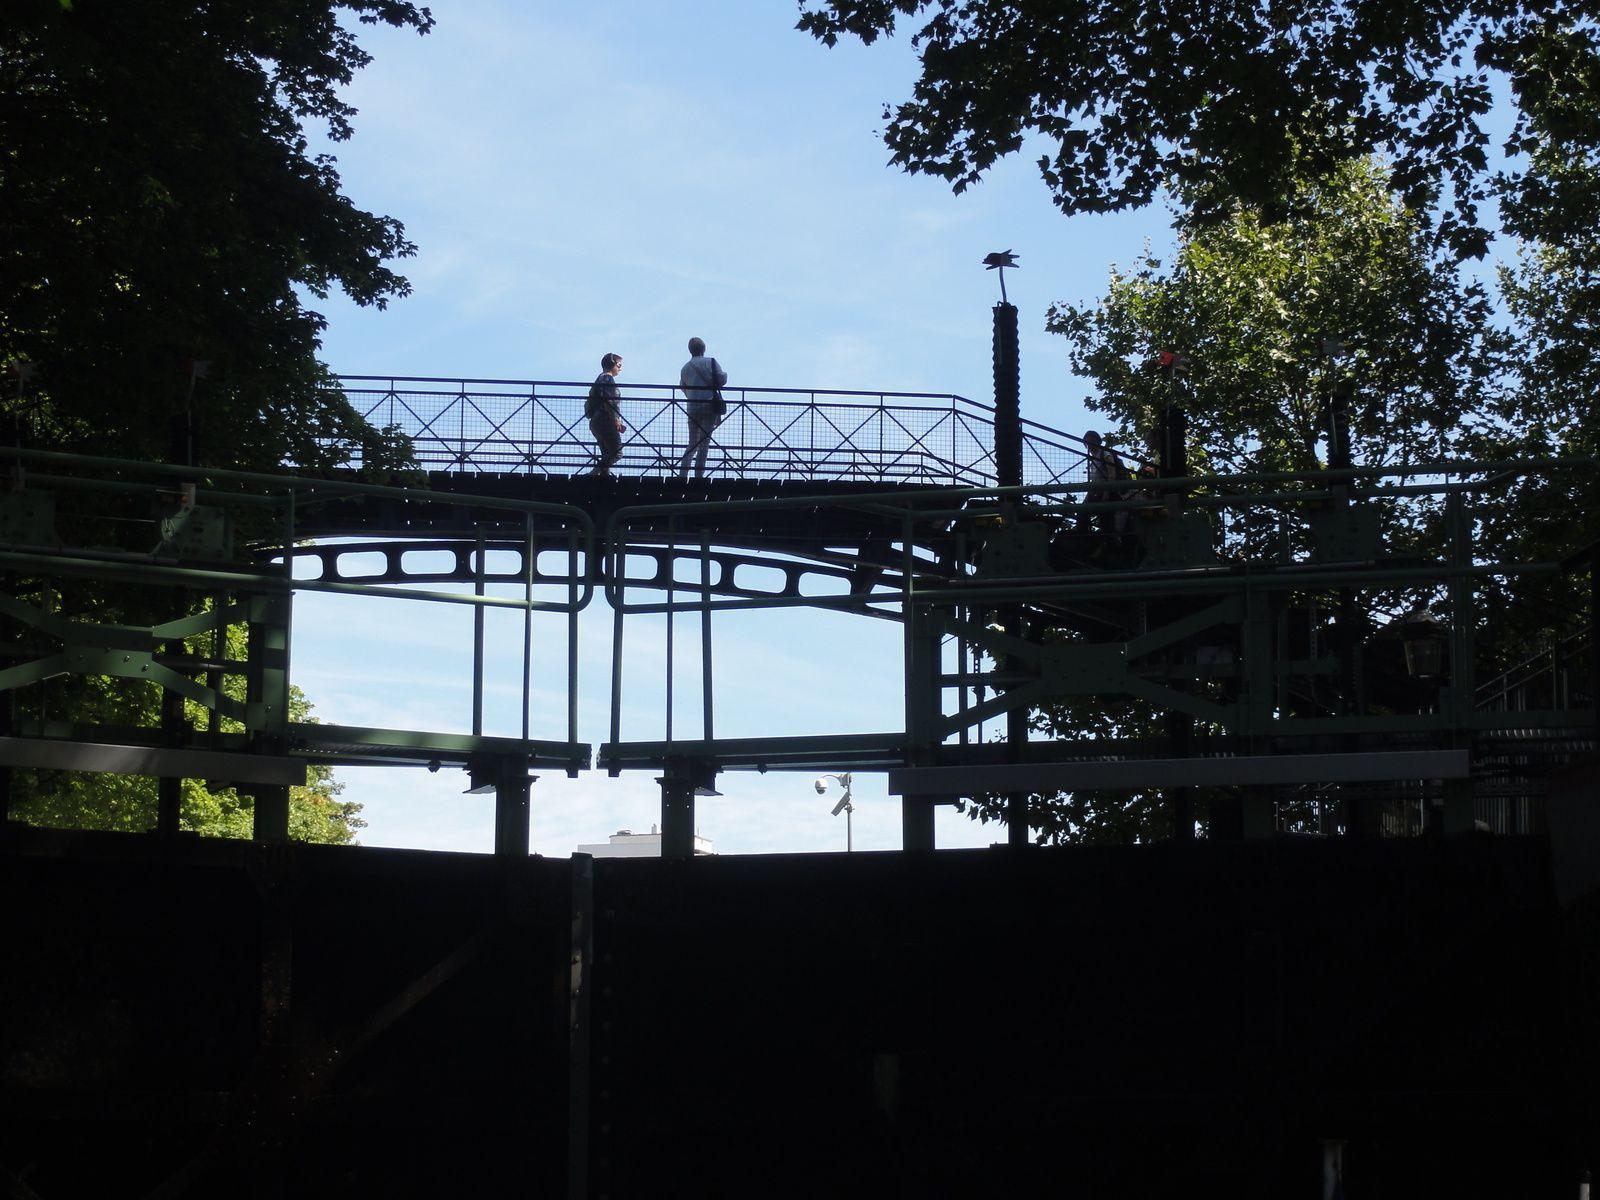 Balade sur le Canal Saint-Martin